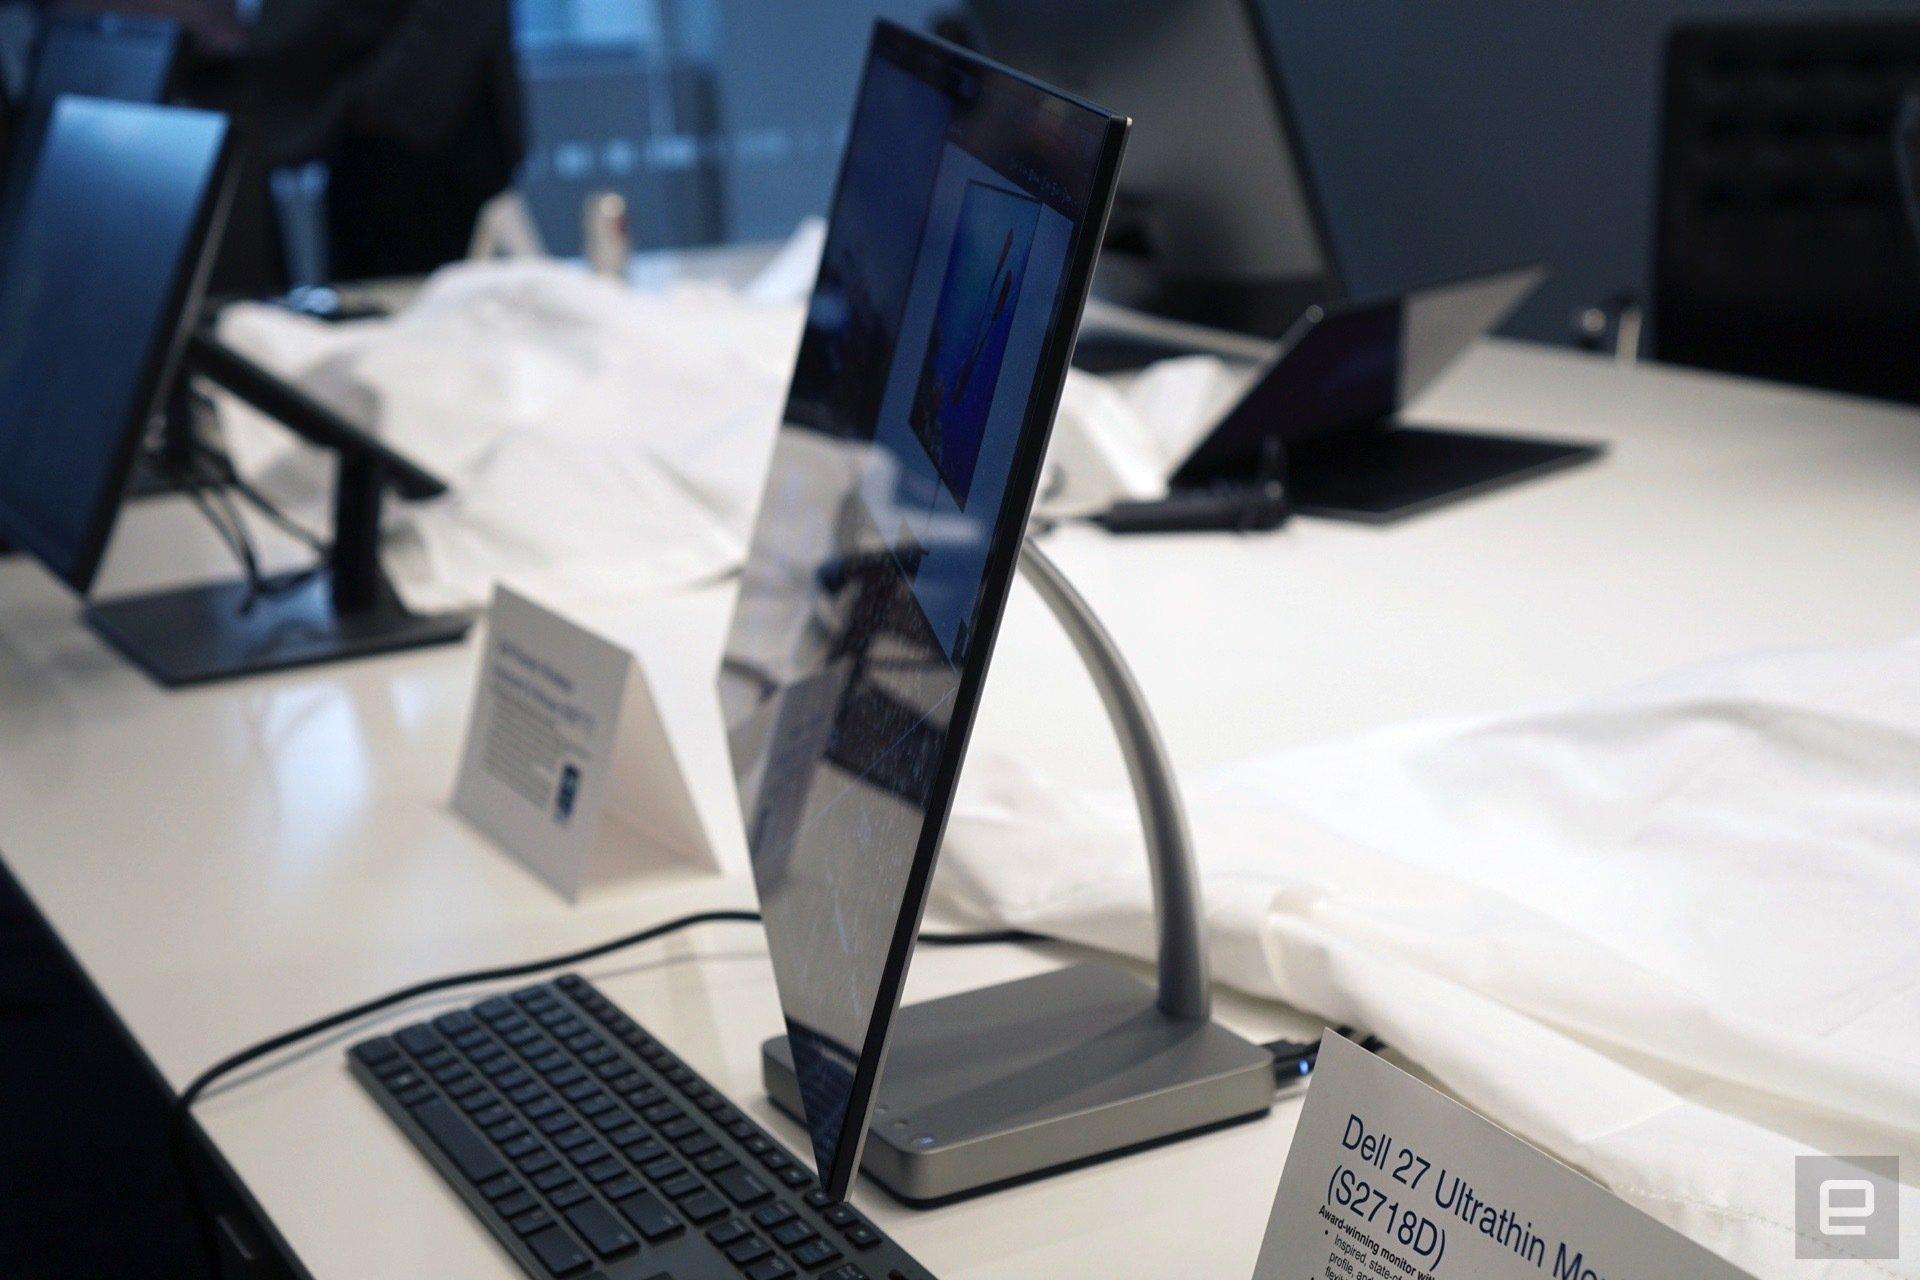 Dell estrena monitor 2K de 27 pulgadas superdelgado | PoderPDA